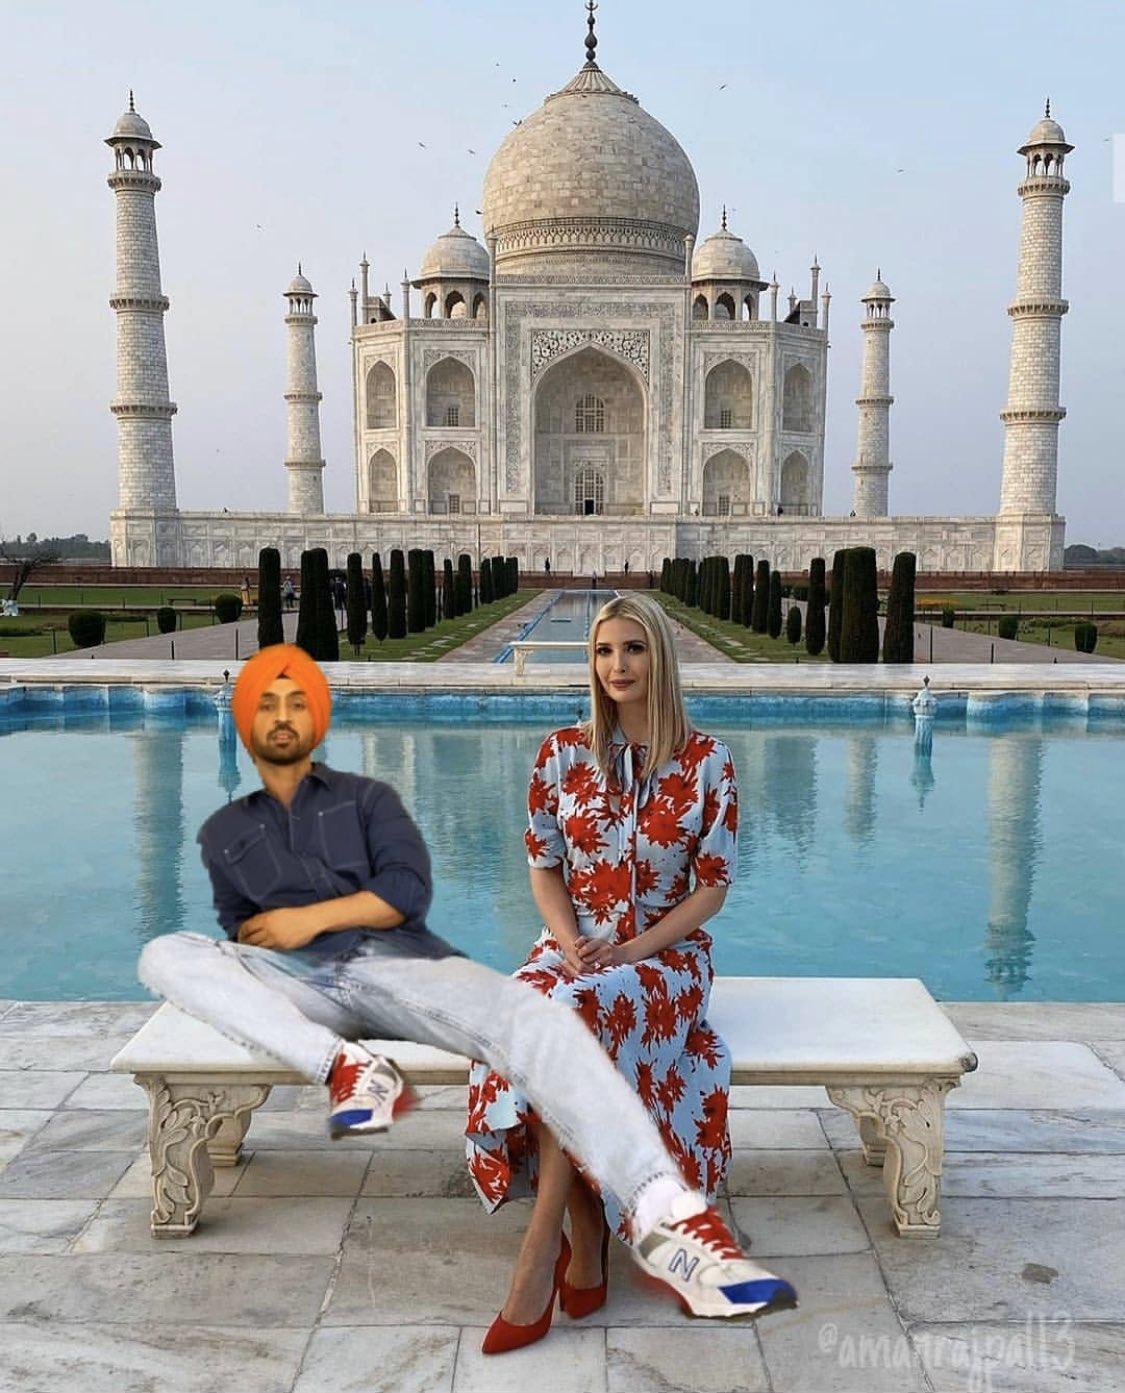 Diljit Dosanjh On Twitter Me Ivanka Piche Hee Pey Gaee Kehndi Taj Mahal Jana Taj Mahal Jana Mai Fer Ley Geya Hor Ki Karda